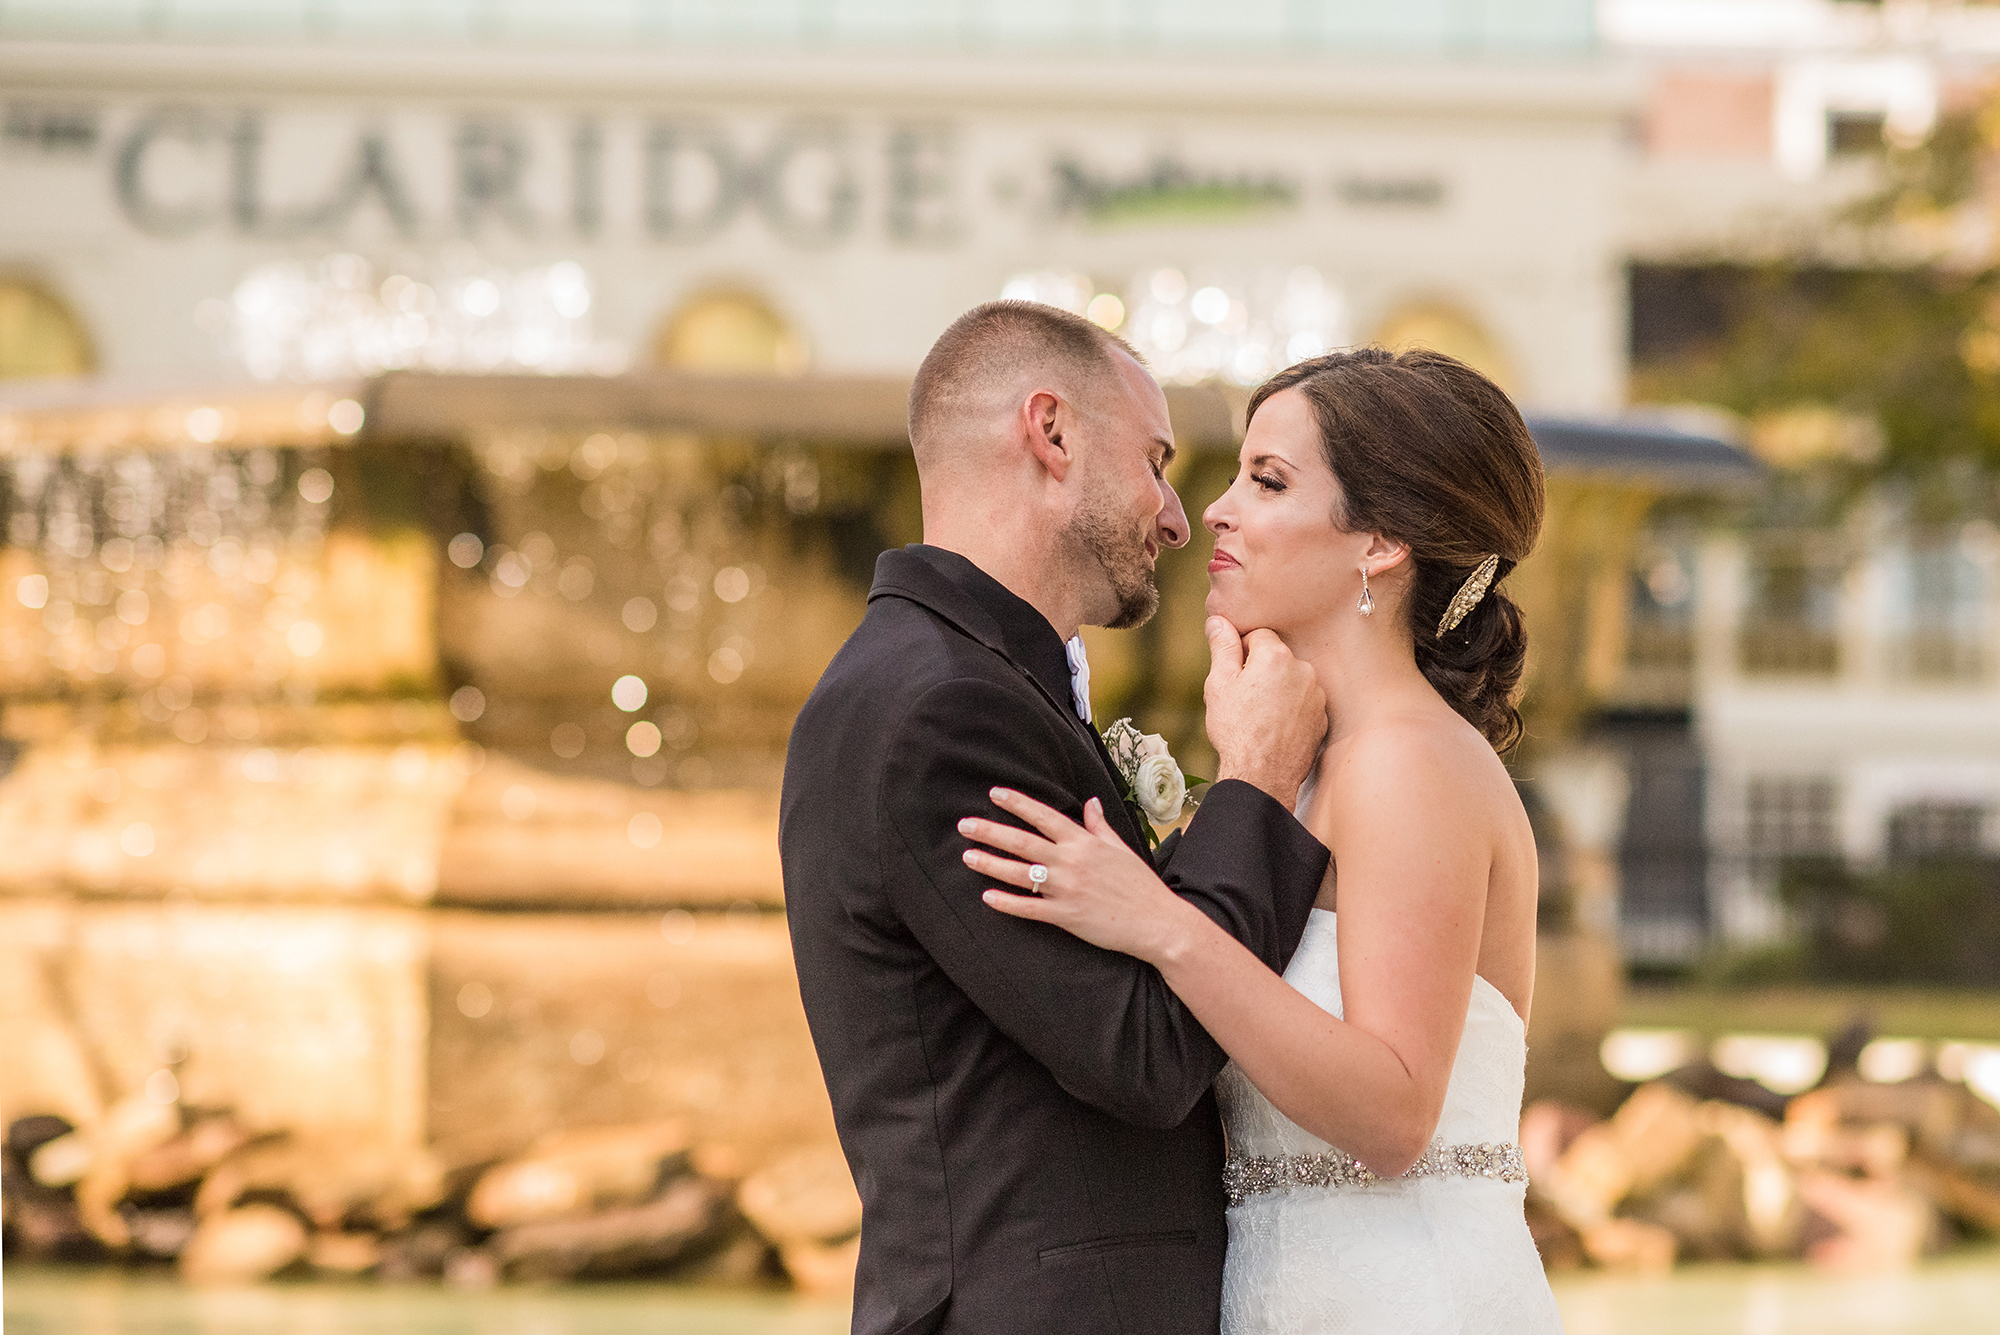 lbi-photographer-ac-wedding-claridge-val-12.jpg